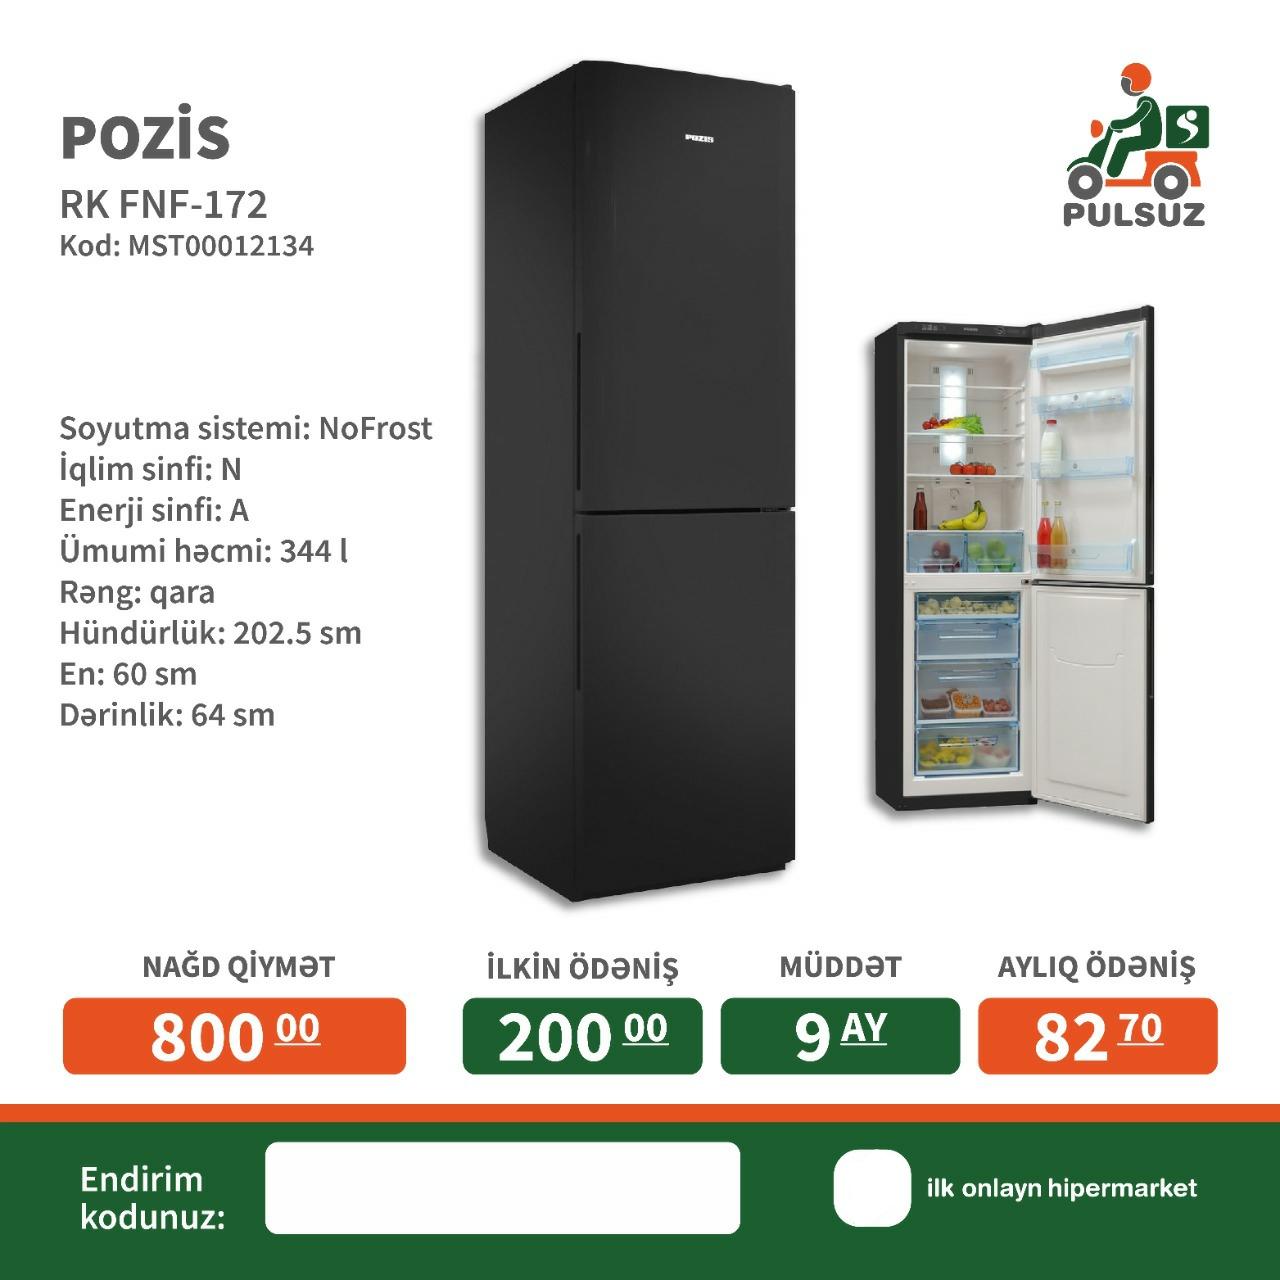 Soyuducu Pozis Ümumi həcmi: 344 lt Soyutma sistemi: NoFrost